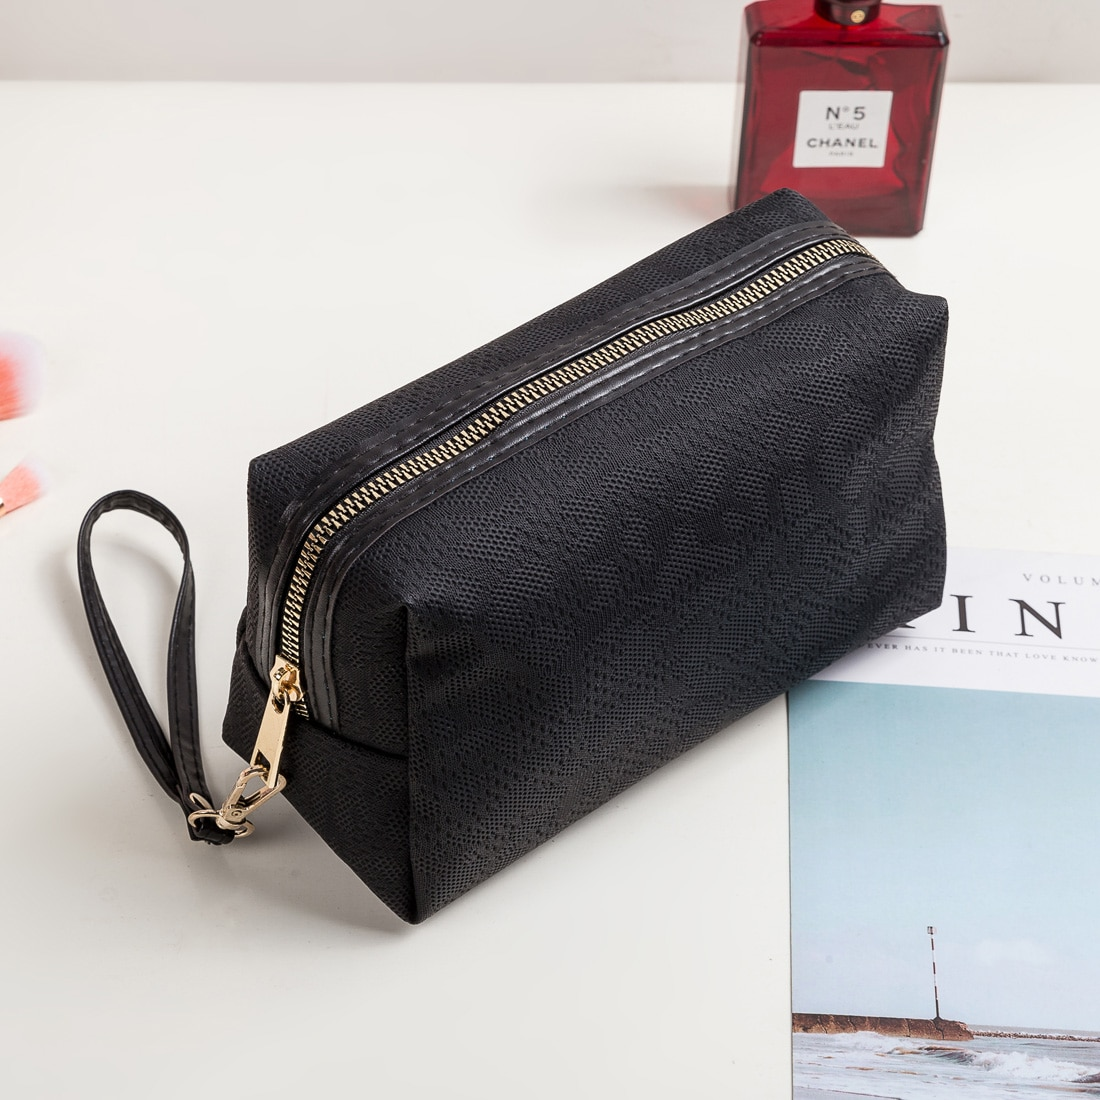 Beauty gran oferta bolso de maquillaje para mujer, bolsa de cosméticos para mujer, bolsa de brochas de maquillaje, gran capacidad, bolsa bonita barata, cosméticos, triangulación de envíos